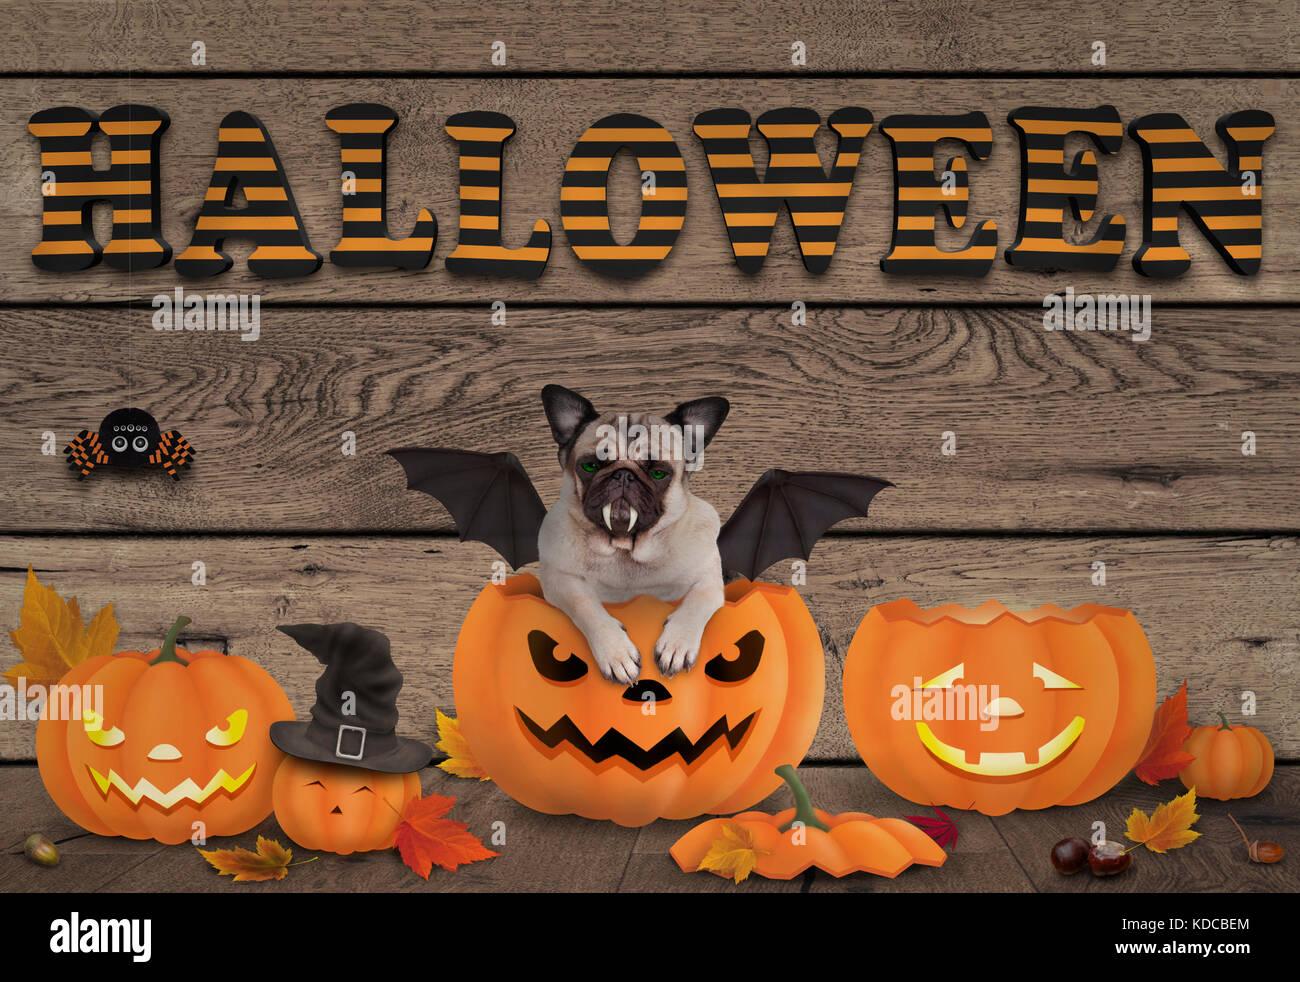 funny halloween pug dog and pumpkin lanterns on wooden background